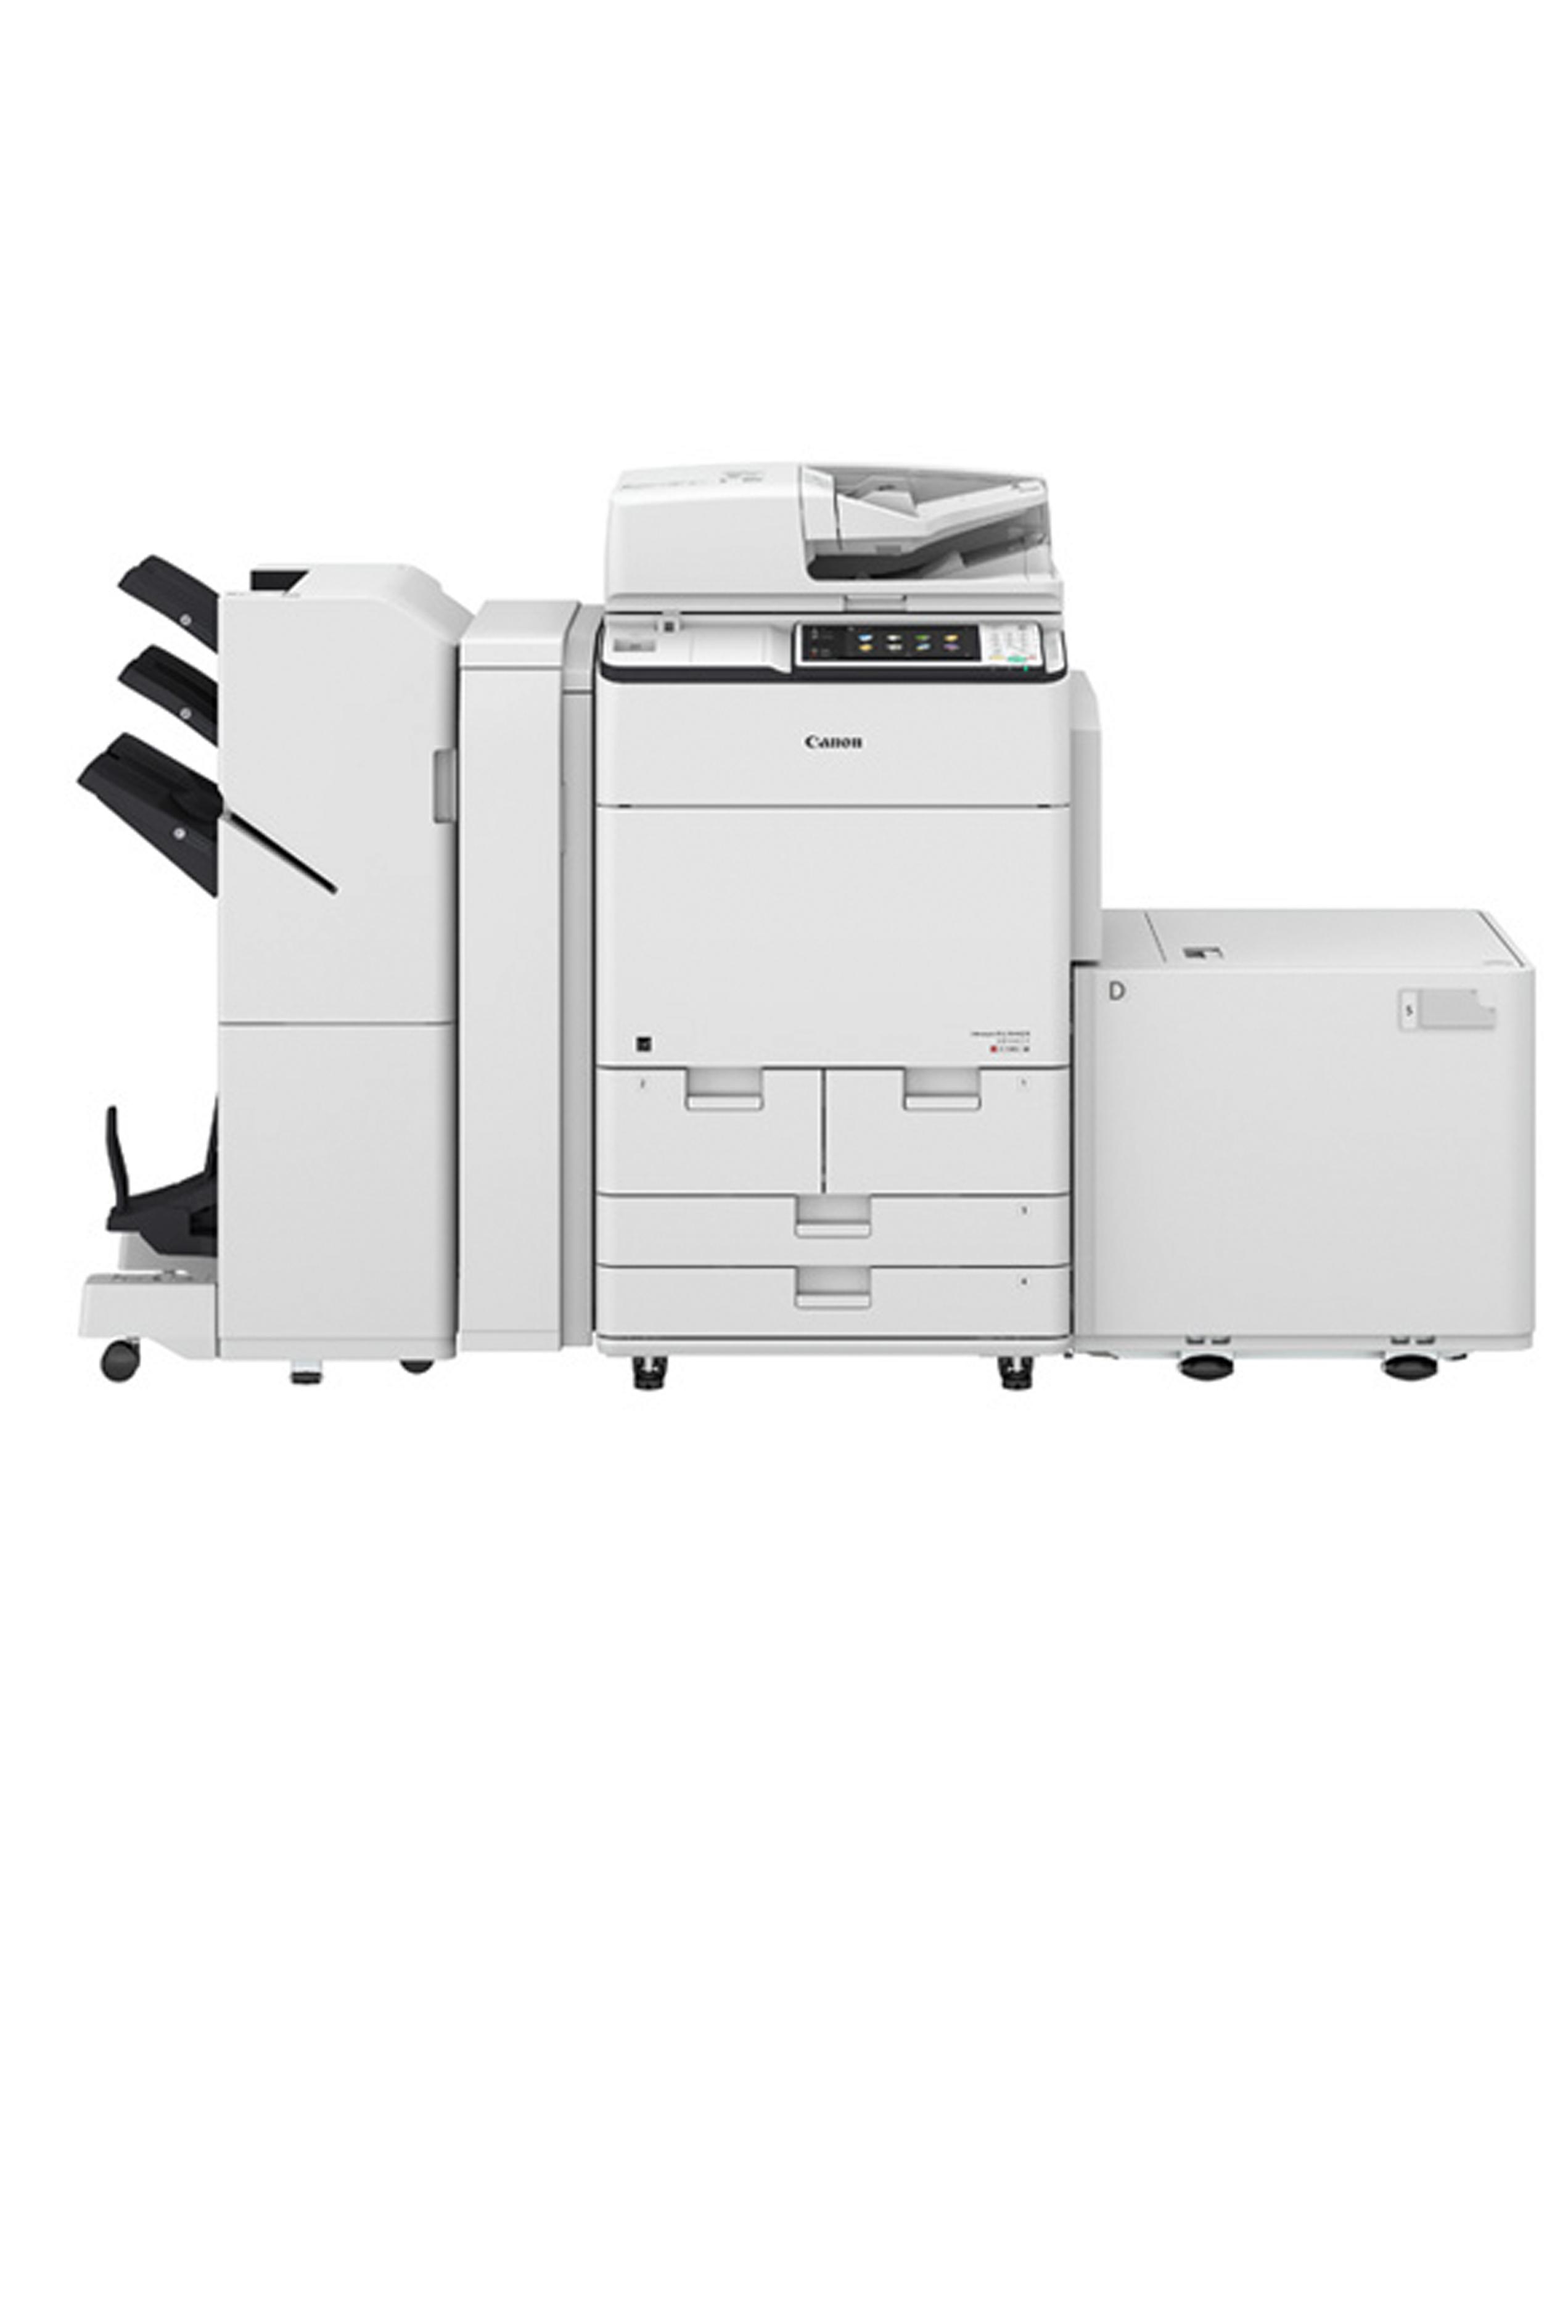 Canon imageRUNNER ADVANCE C7580i III (80/70ppm)